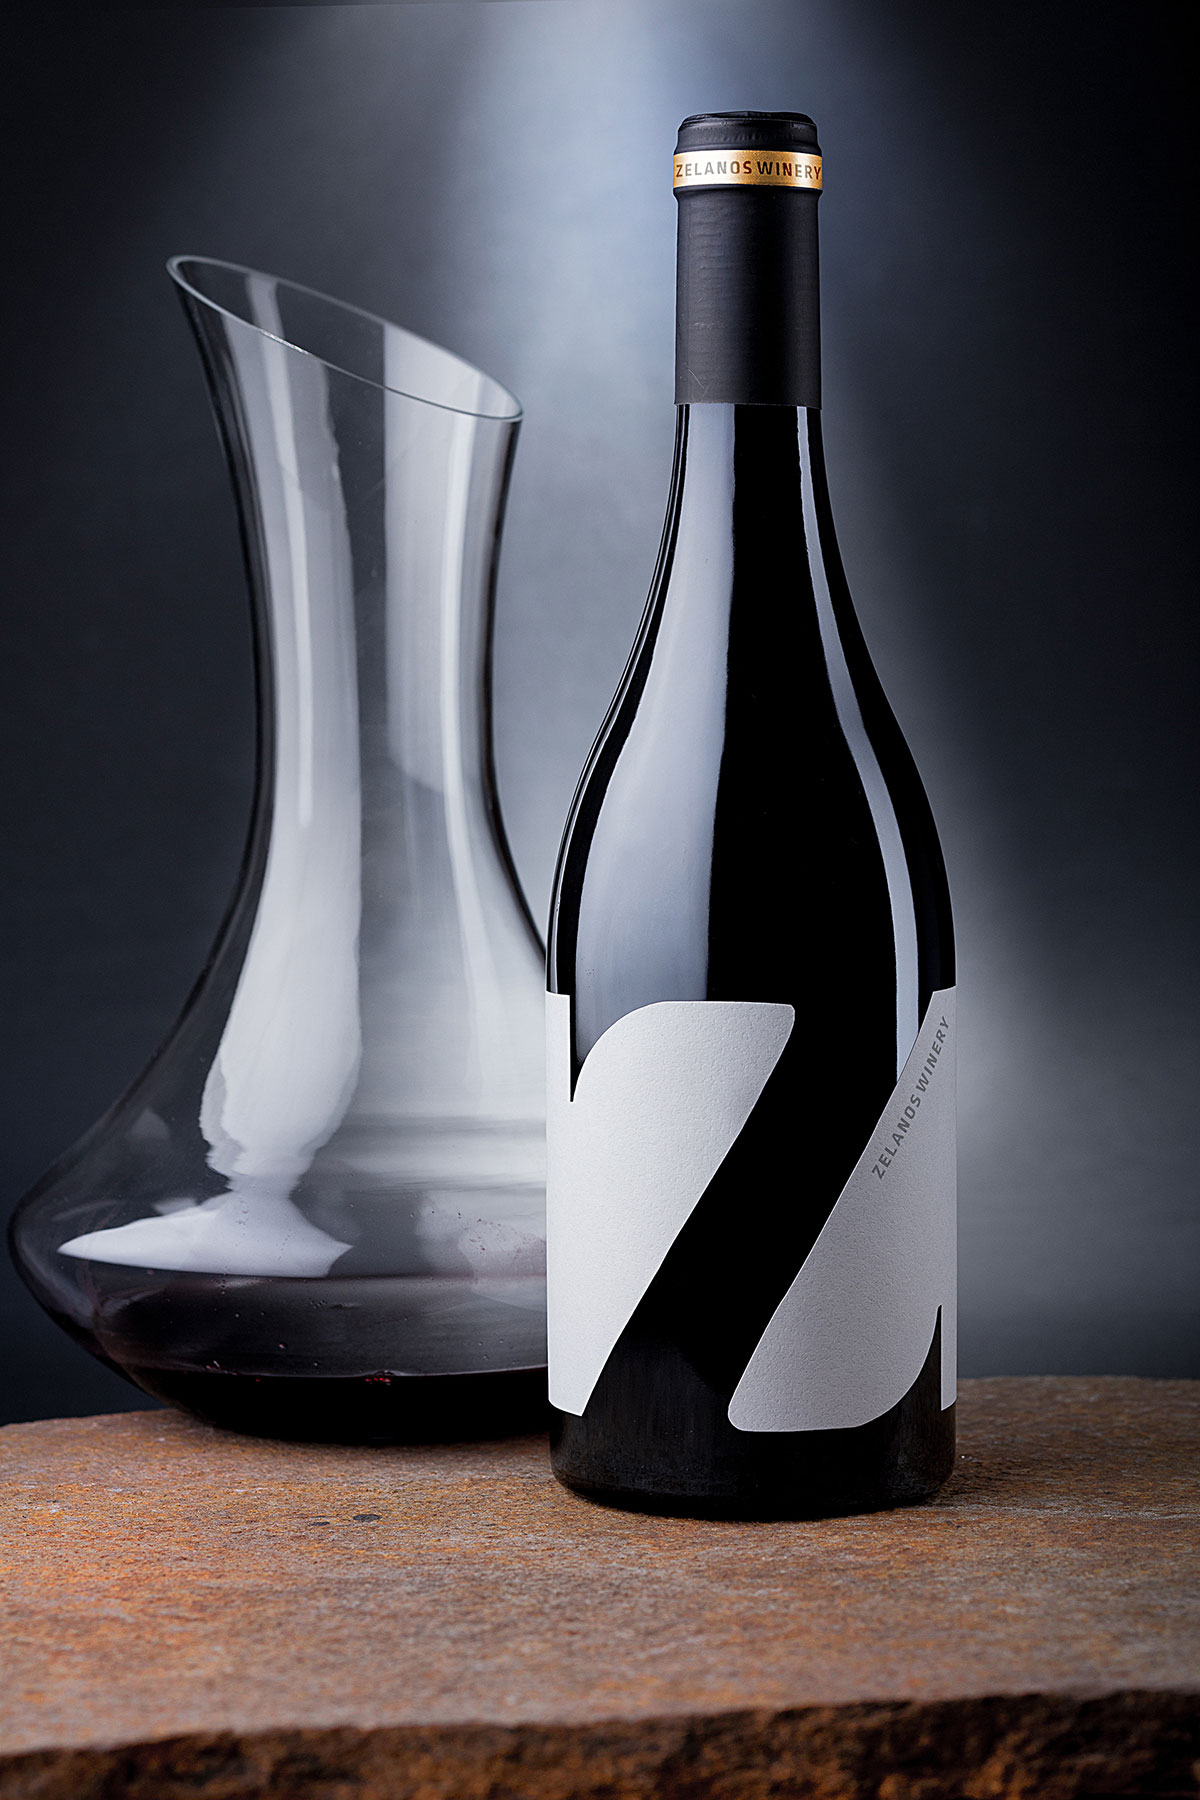 Z wine labels